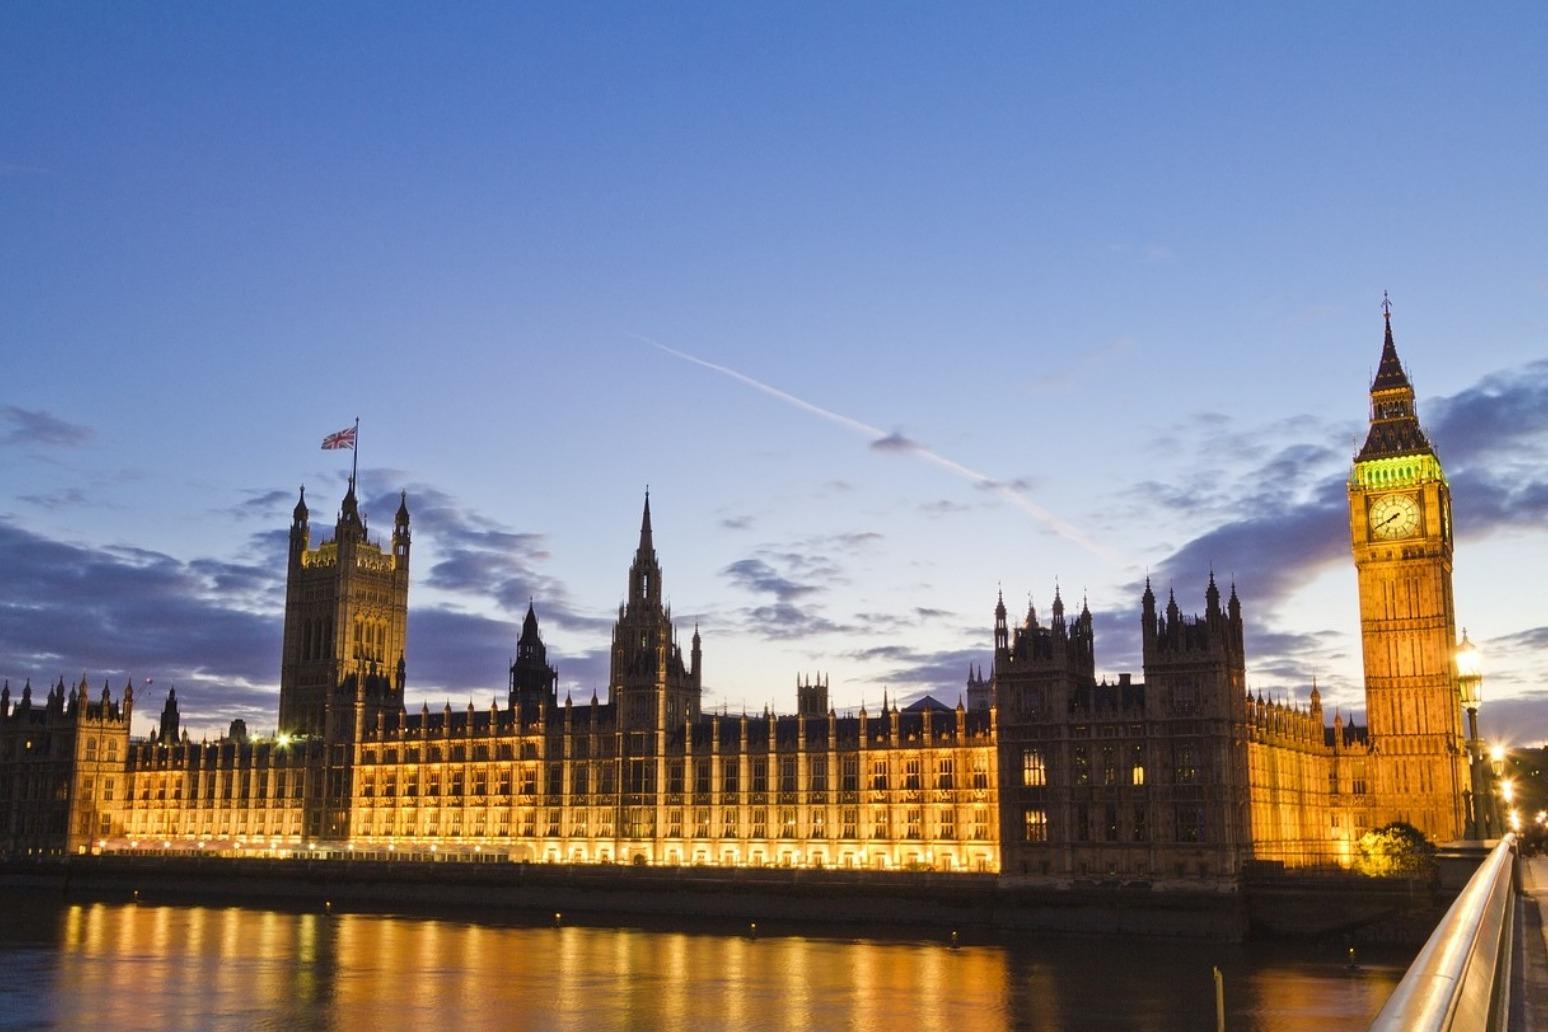 Parliament to back Government over customs union - Davis